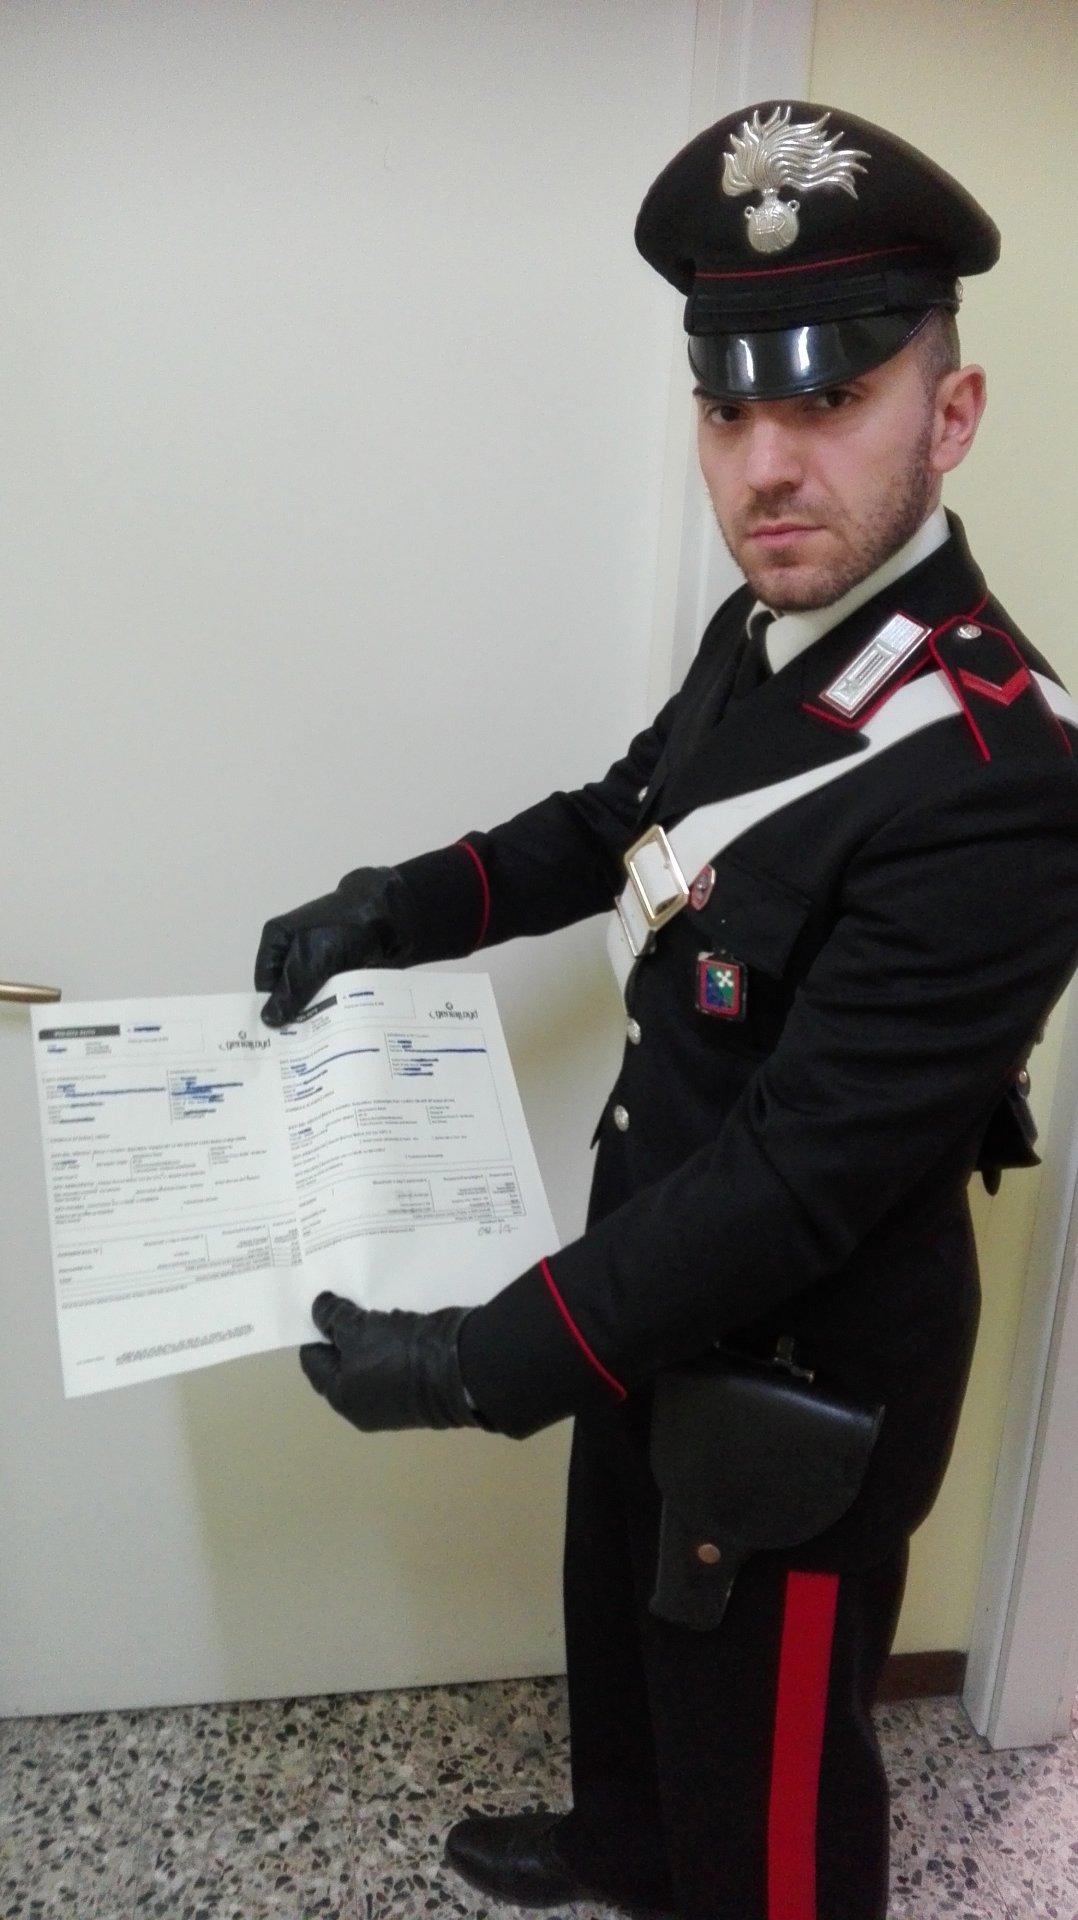 Polizze false arrestato assicuratore